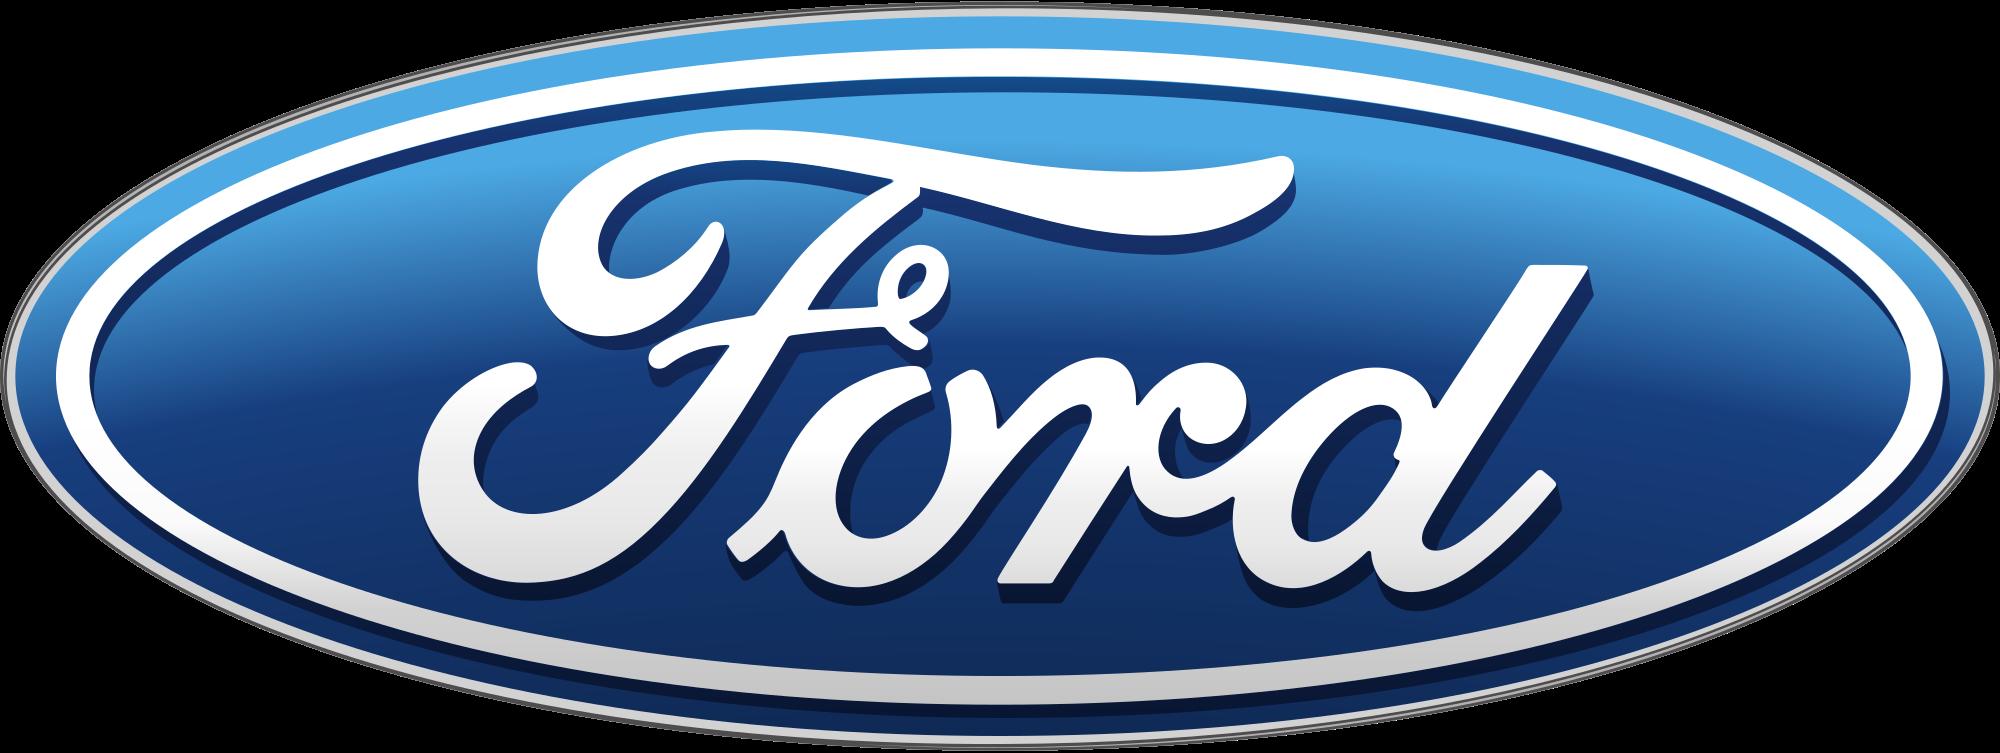 New Ford Ecosport For Sale In Saginaw Bay City Vin Automotive Wiring Sagin Workshop Car Manualsrepair Books Maj6p1ul9jc182965 Stock 185274